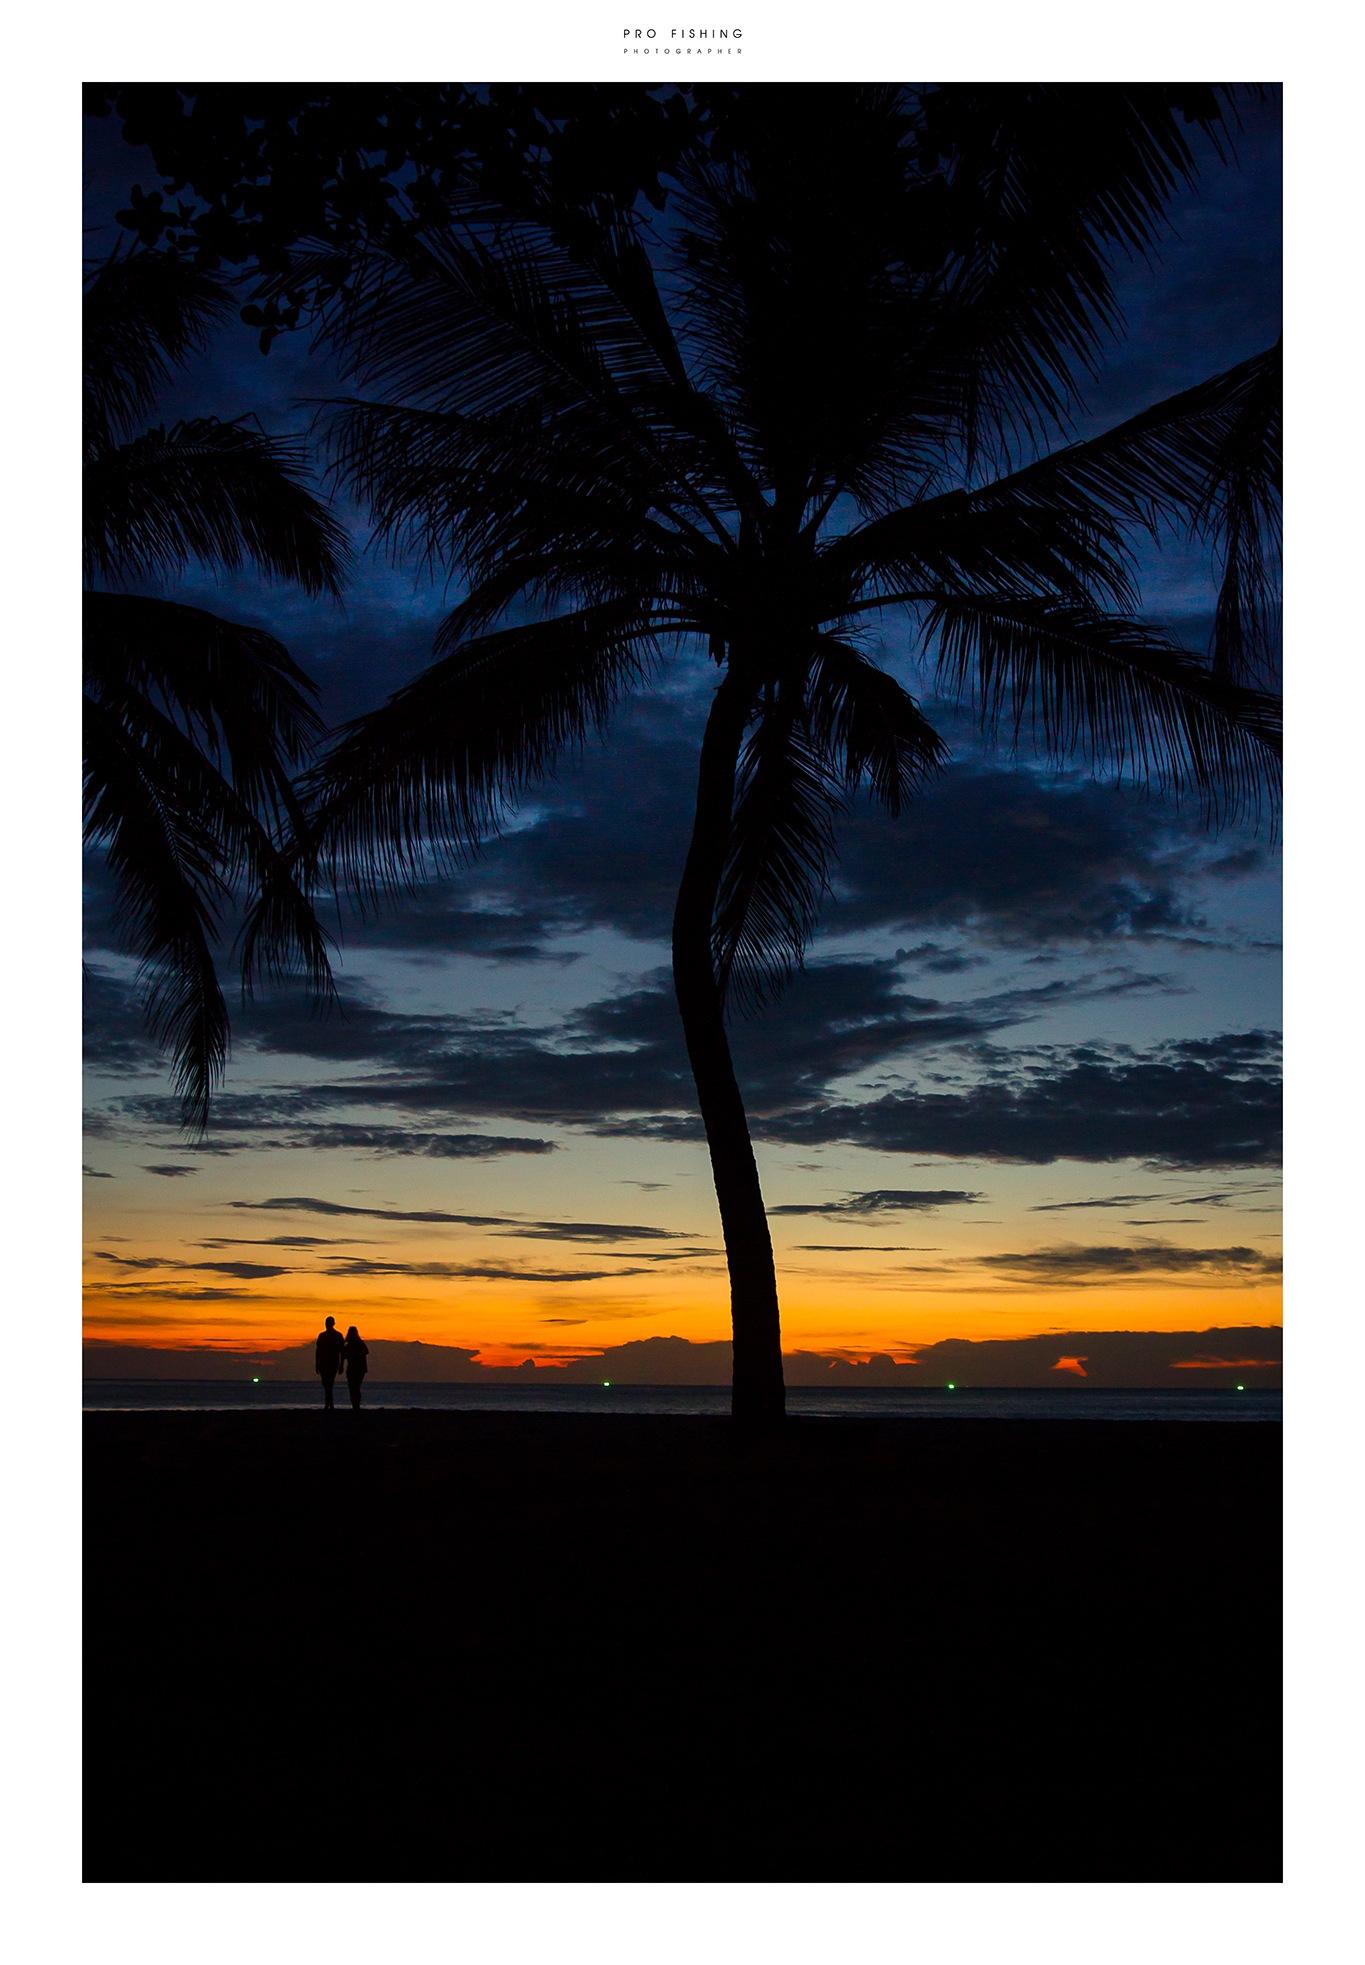 Twilight  by Pro Fishing Photographer